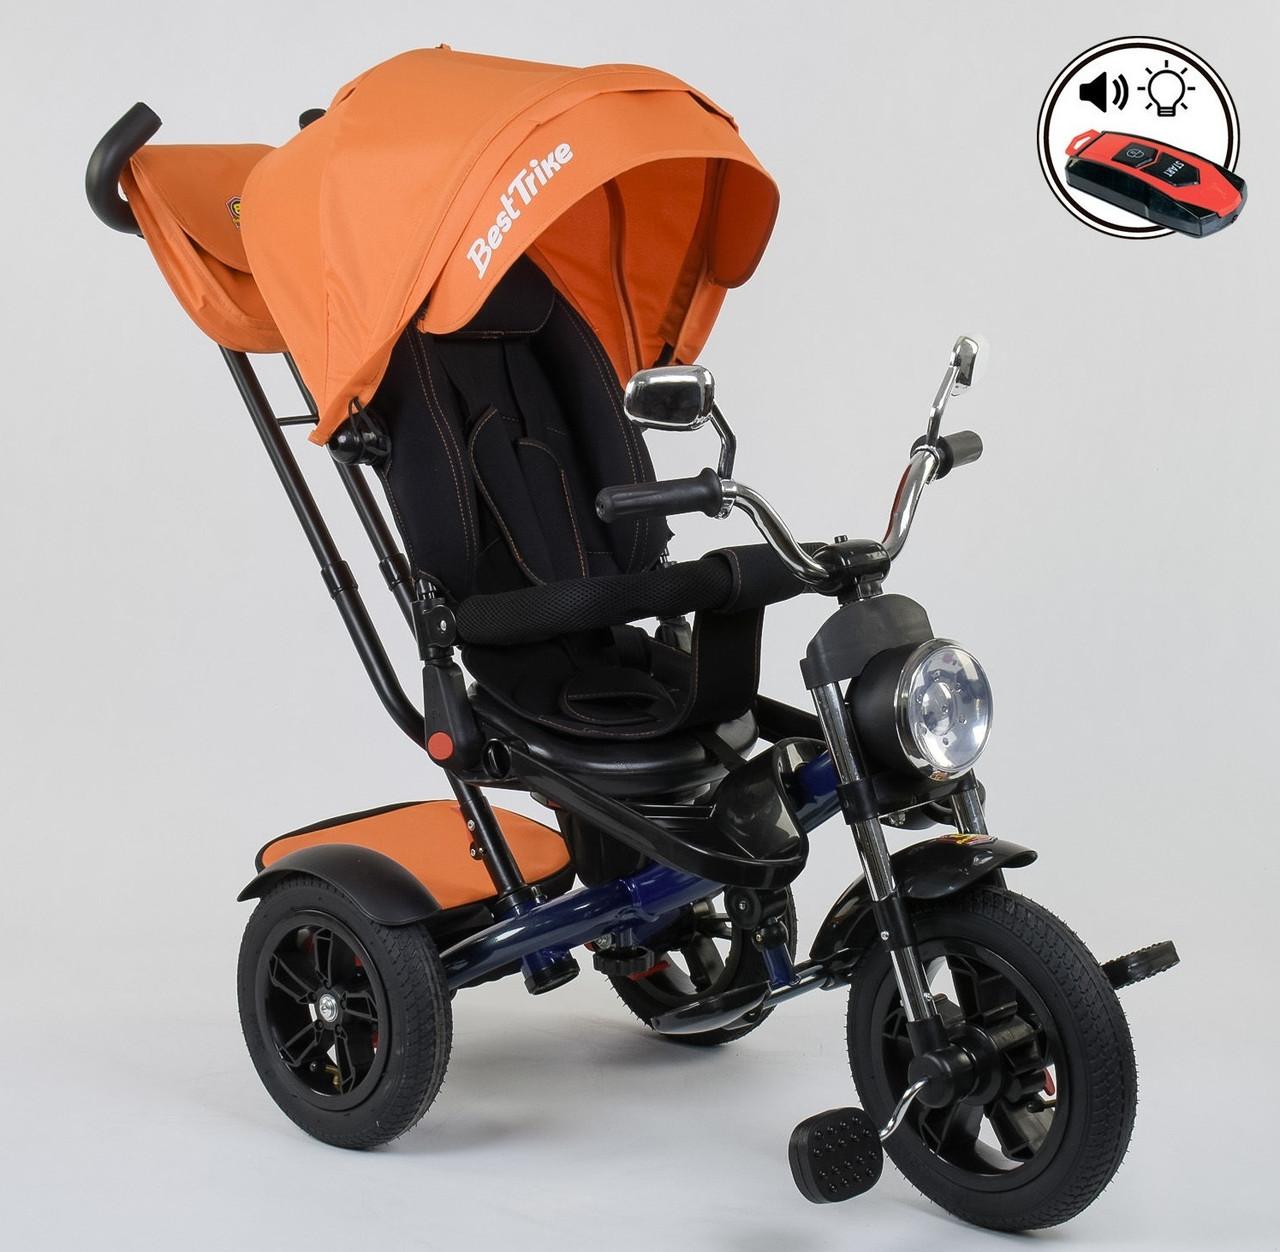 Best Trike Велосипед Best Trike 4490 - 2903 Orange / Blue (4490)